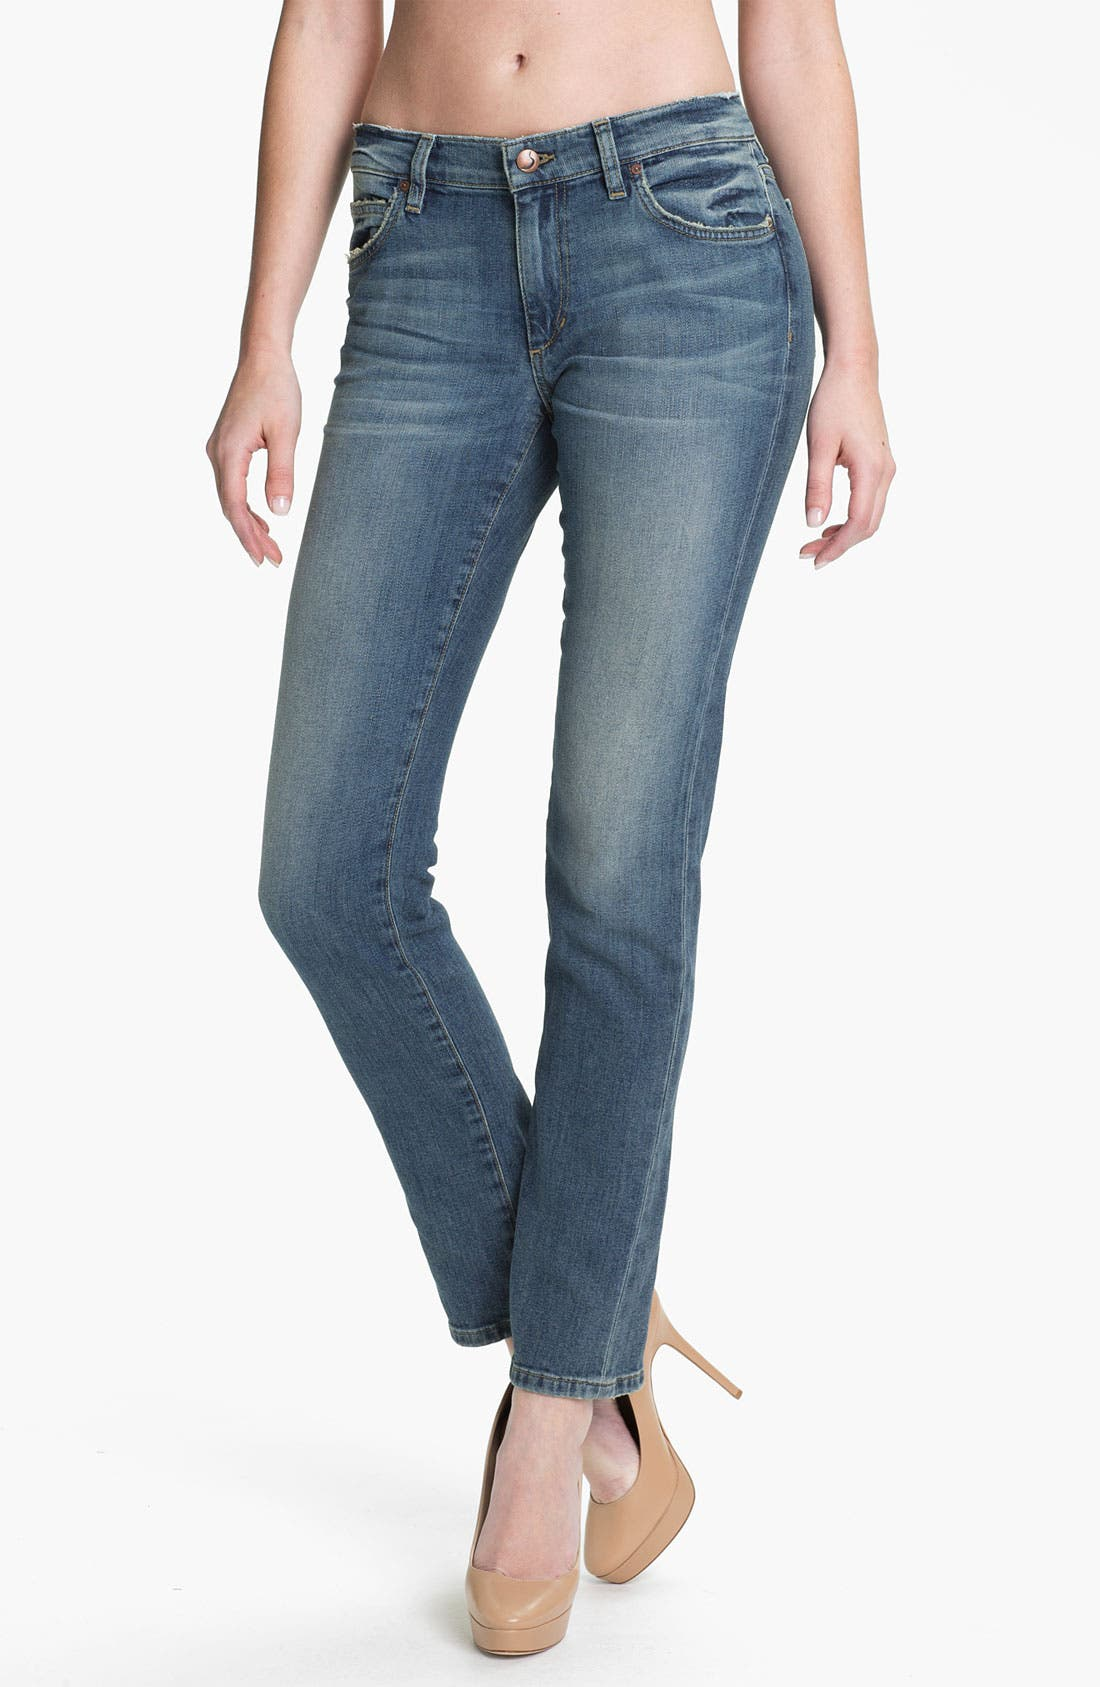 Alternate Image 1 Selected - Joe's 'Easy Slim' Vintage Wash Jeans (Tess)